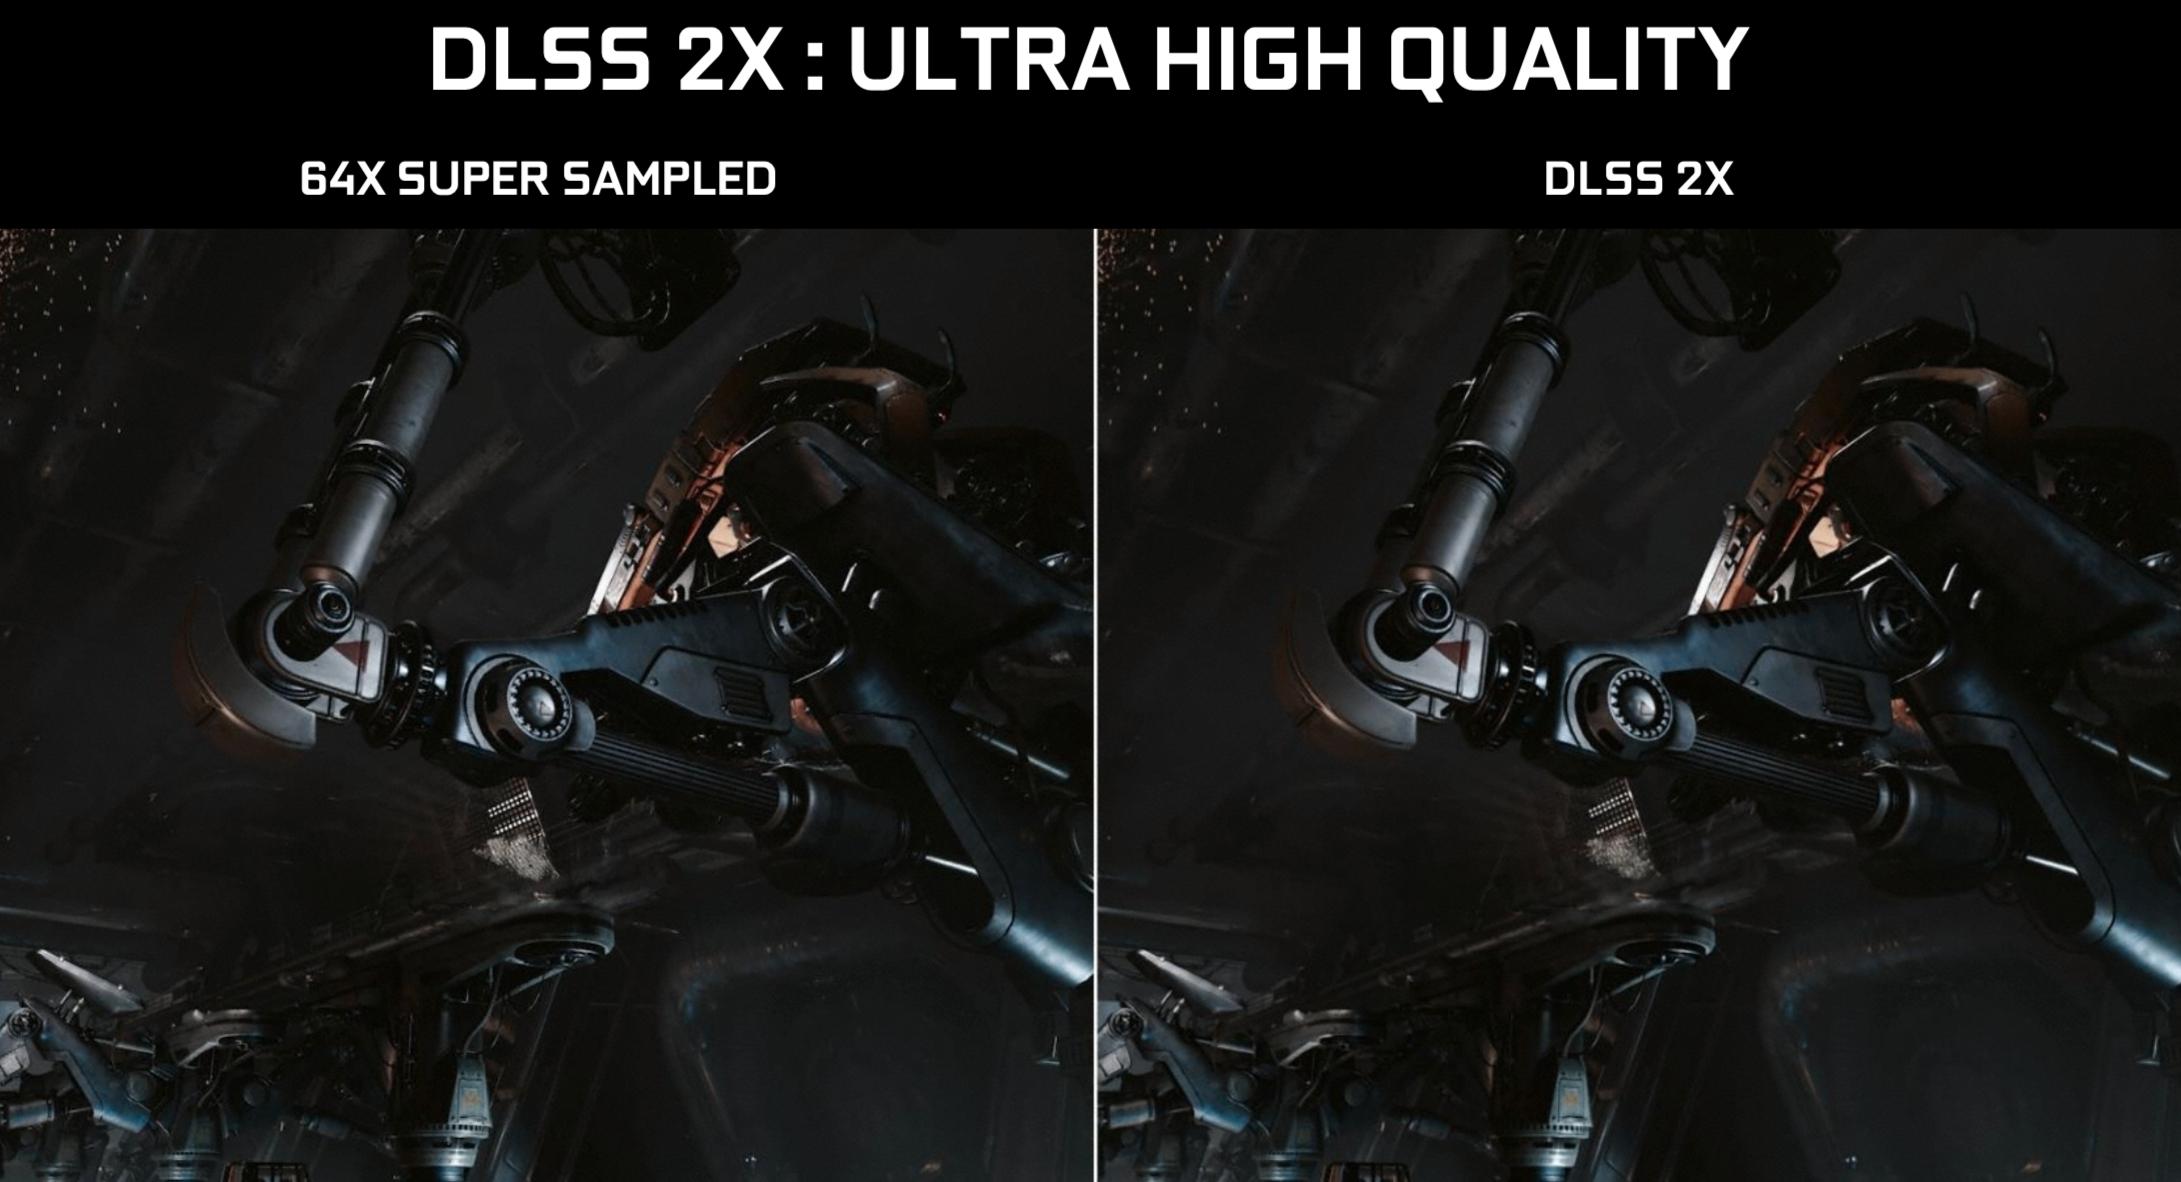 Disse to utjevningsteknikkene skal vare omtrent like presise, men der SSx64 vil knele maskinen din skal DLSSx2 flyte som smør.